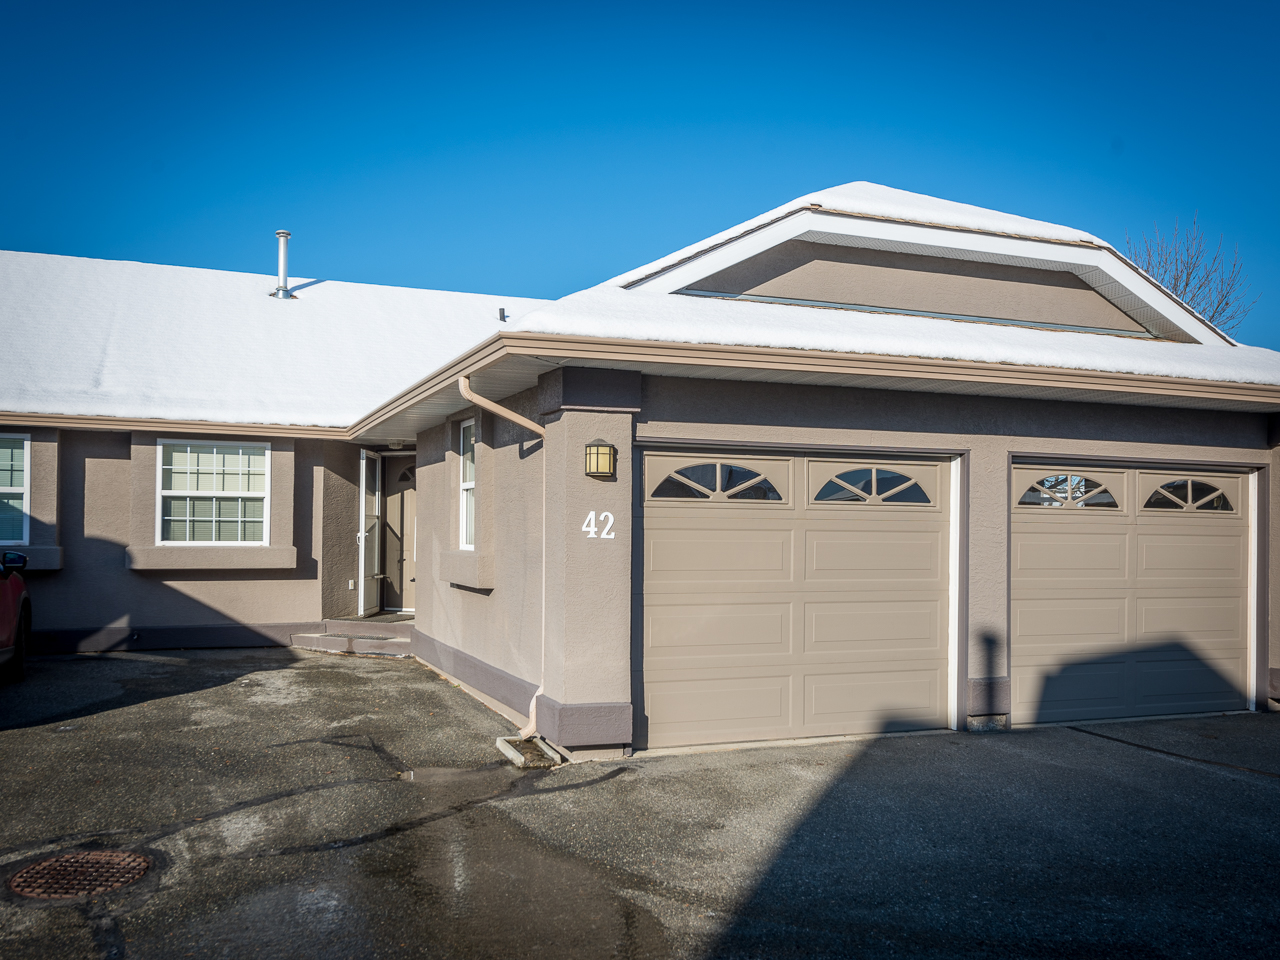 42-1750 McKinley Crt, Sahali, Kamloops Real Estate For Sale